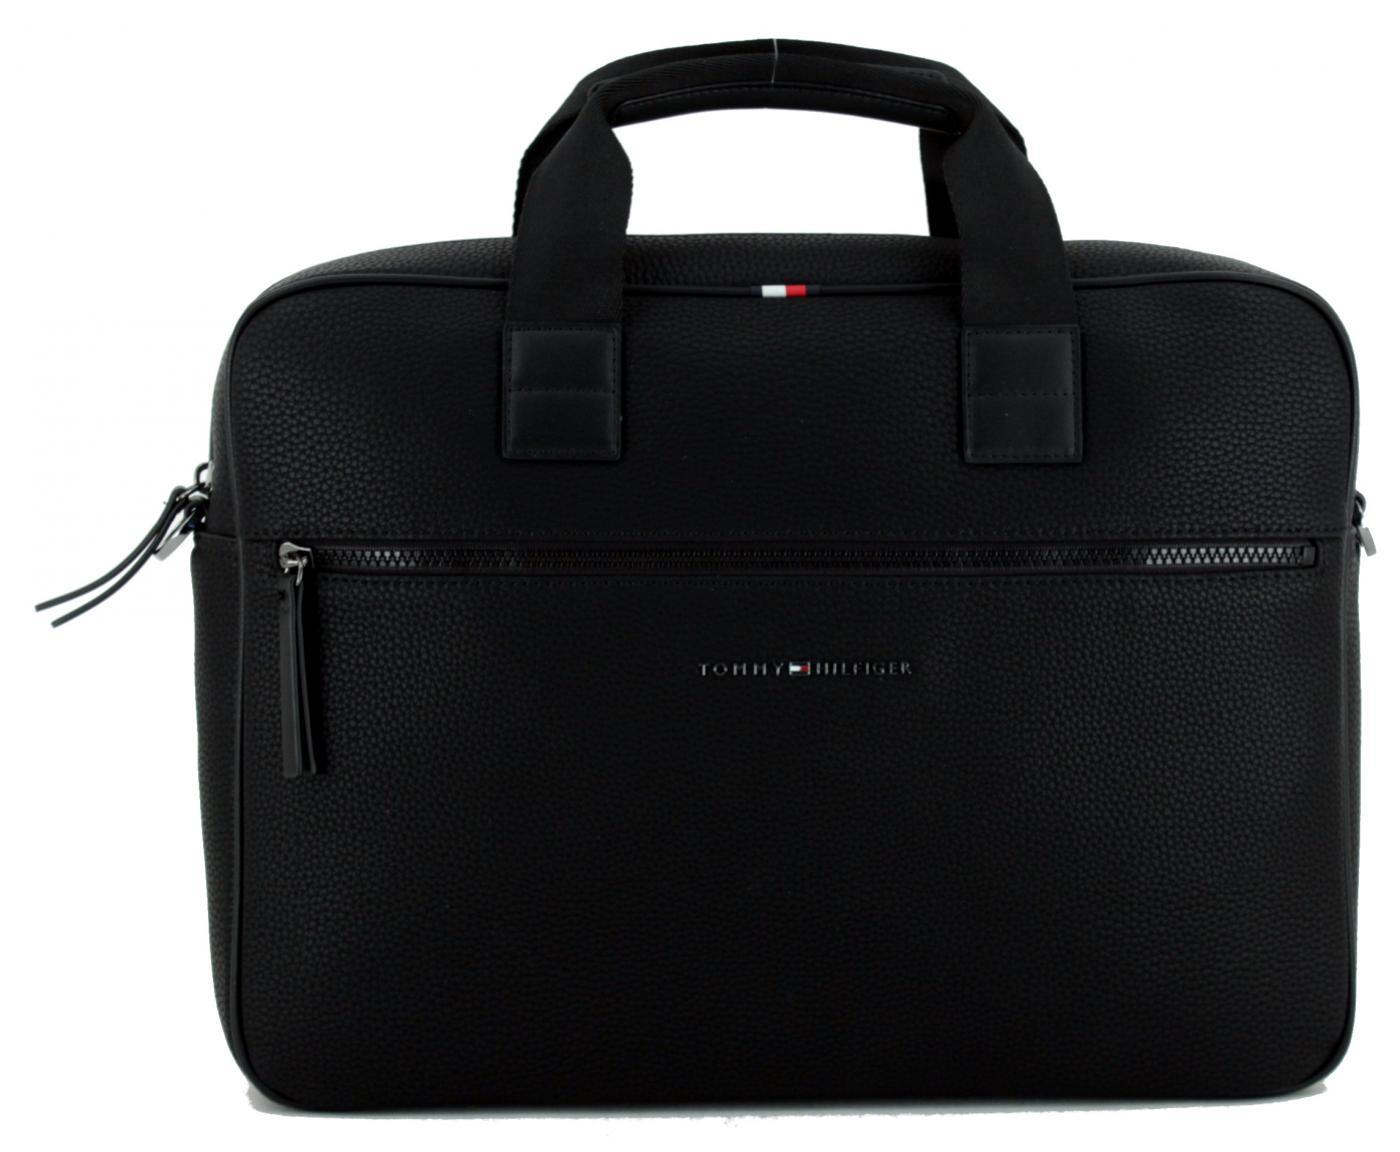 Computer Bag Tommy Hilfiger Laptoptasche Essential Black schwarz Lederimitat